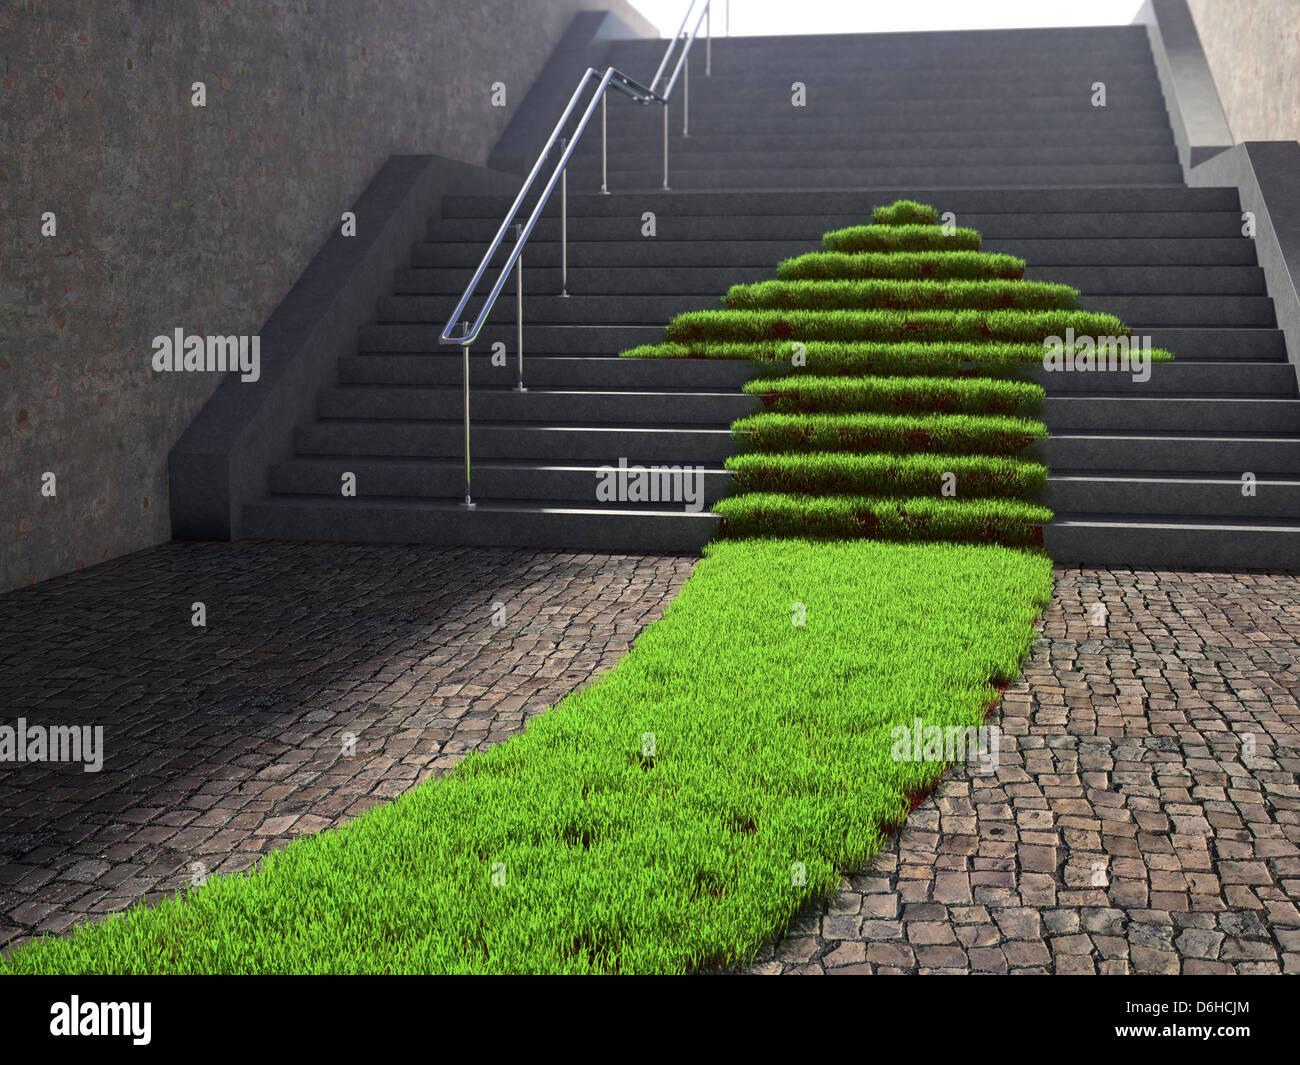 Urban ecology, conceptual artwork - Stock Image